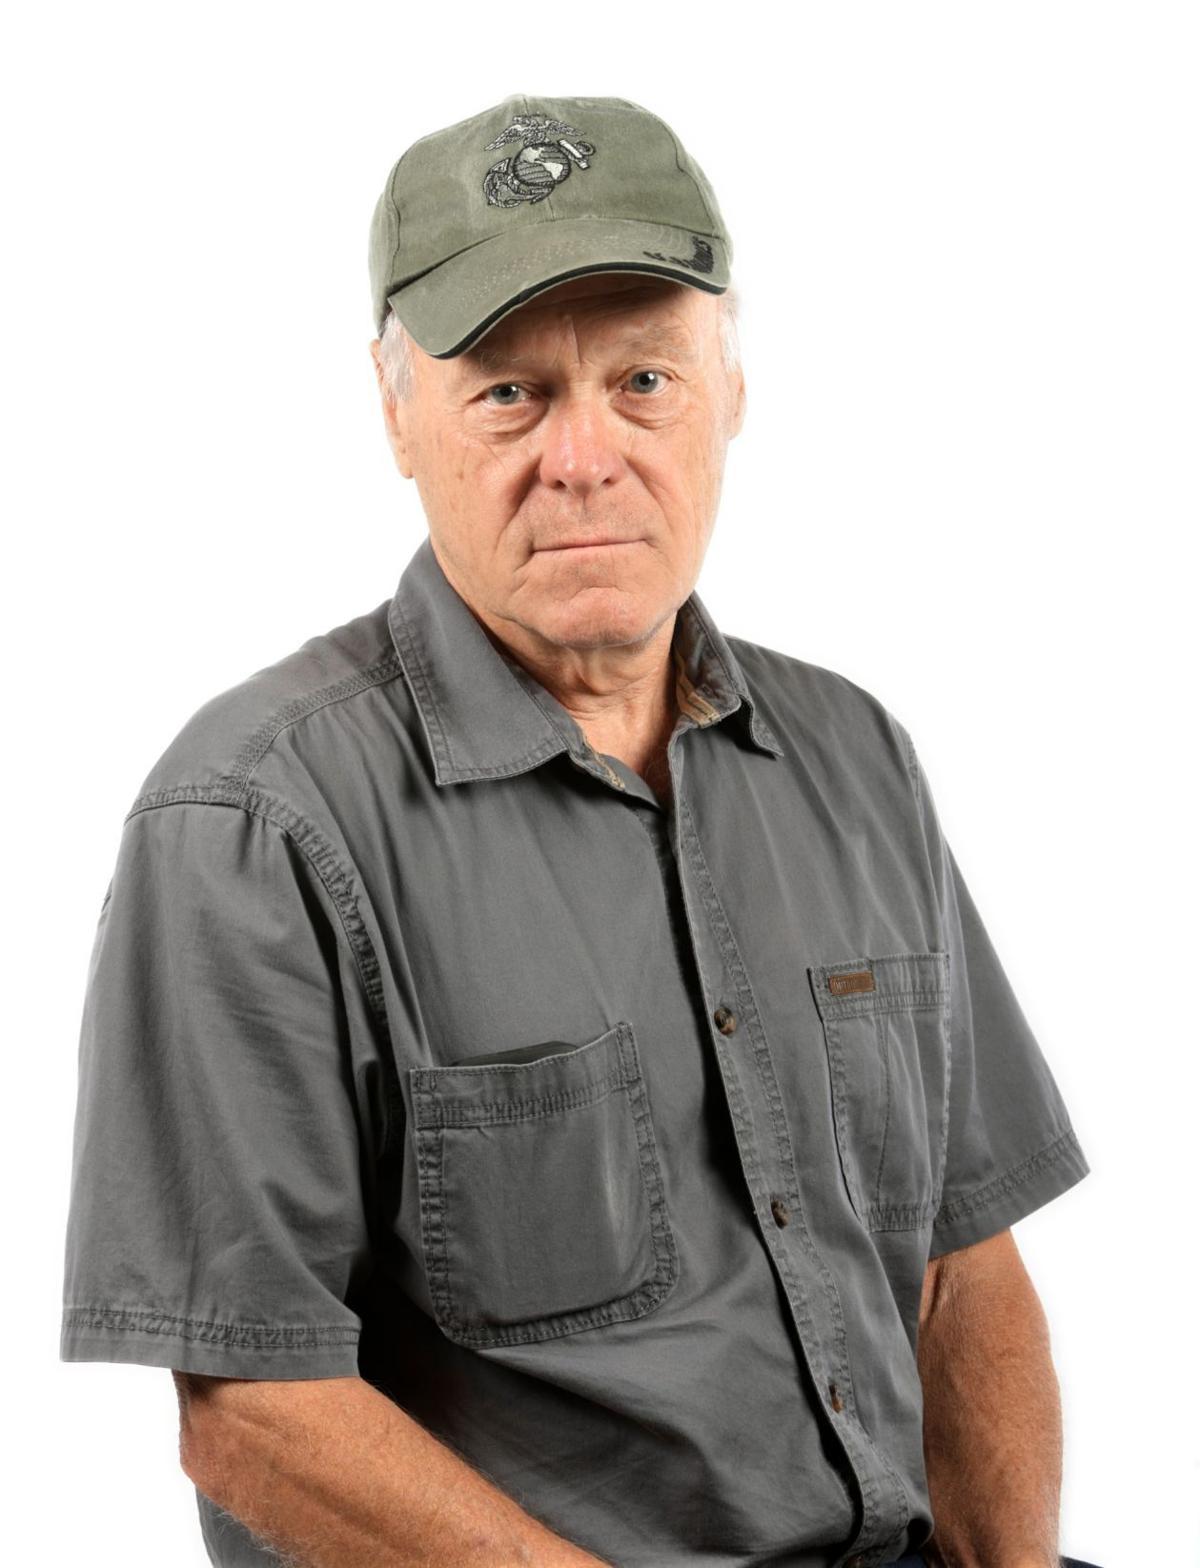 Vietnam veteran Ralph McKinney